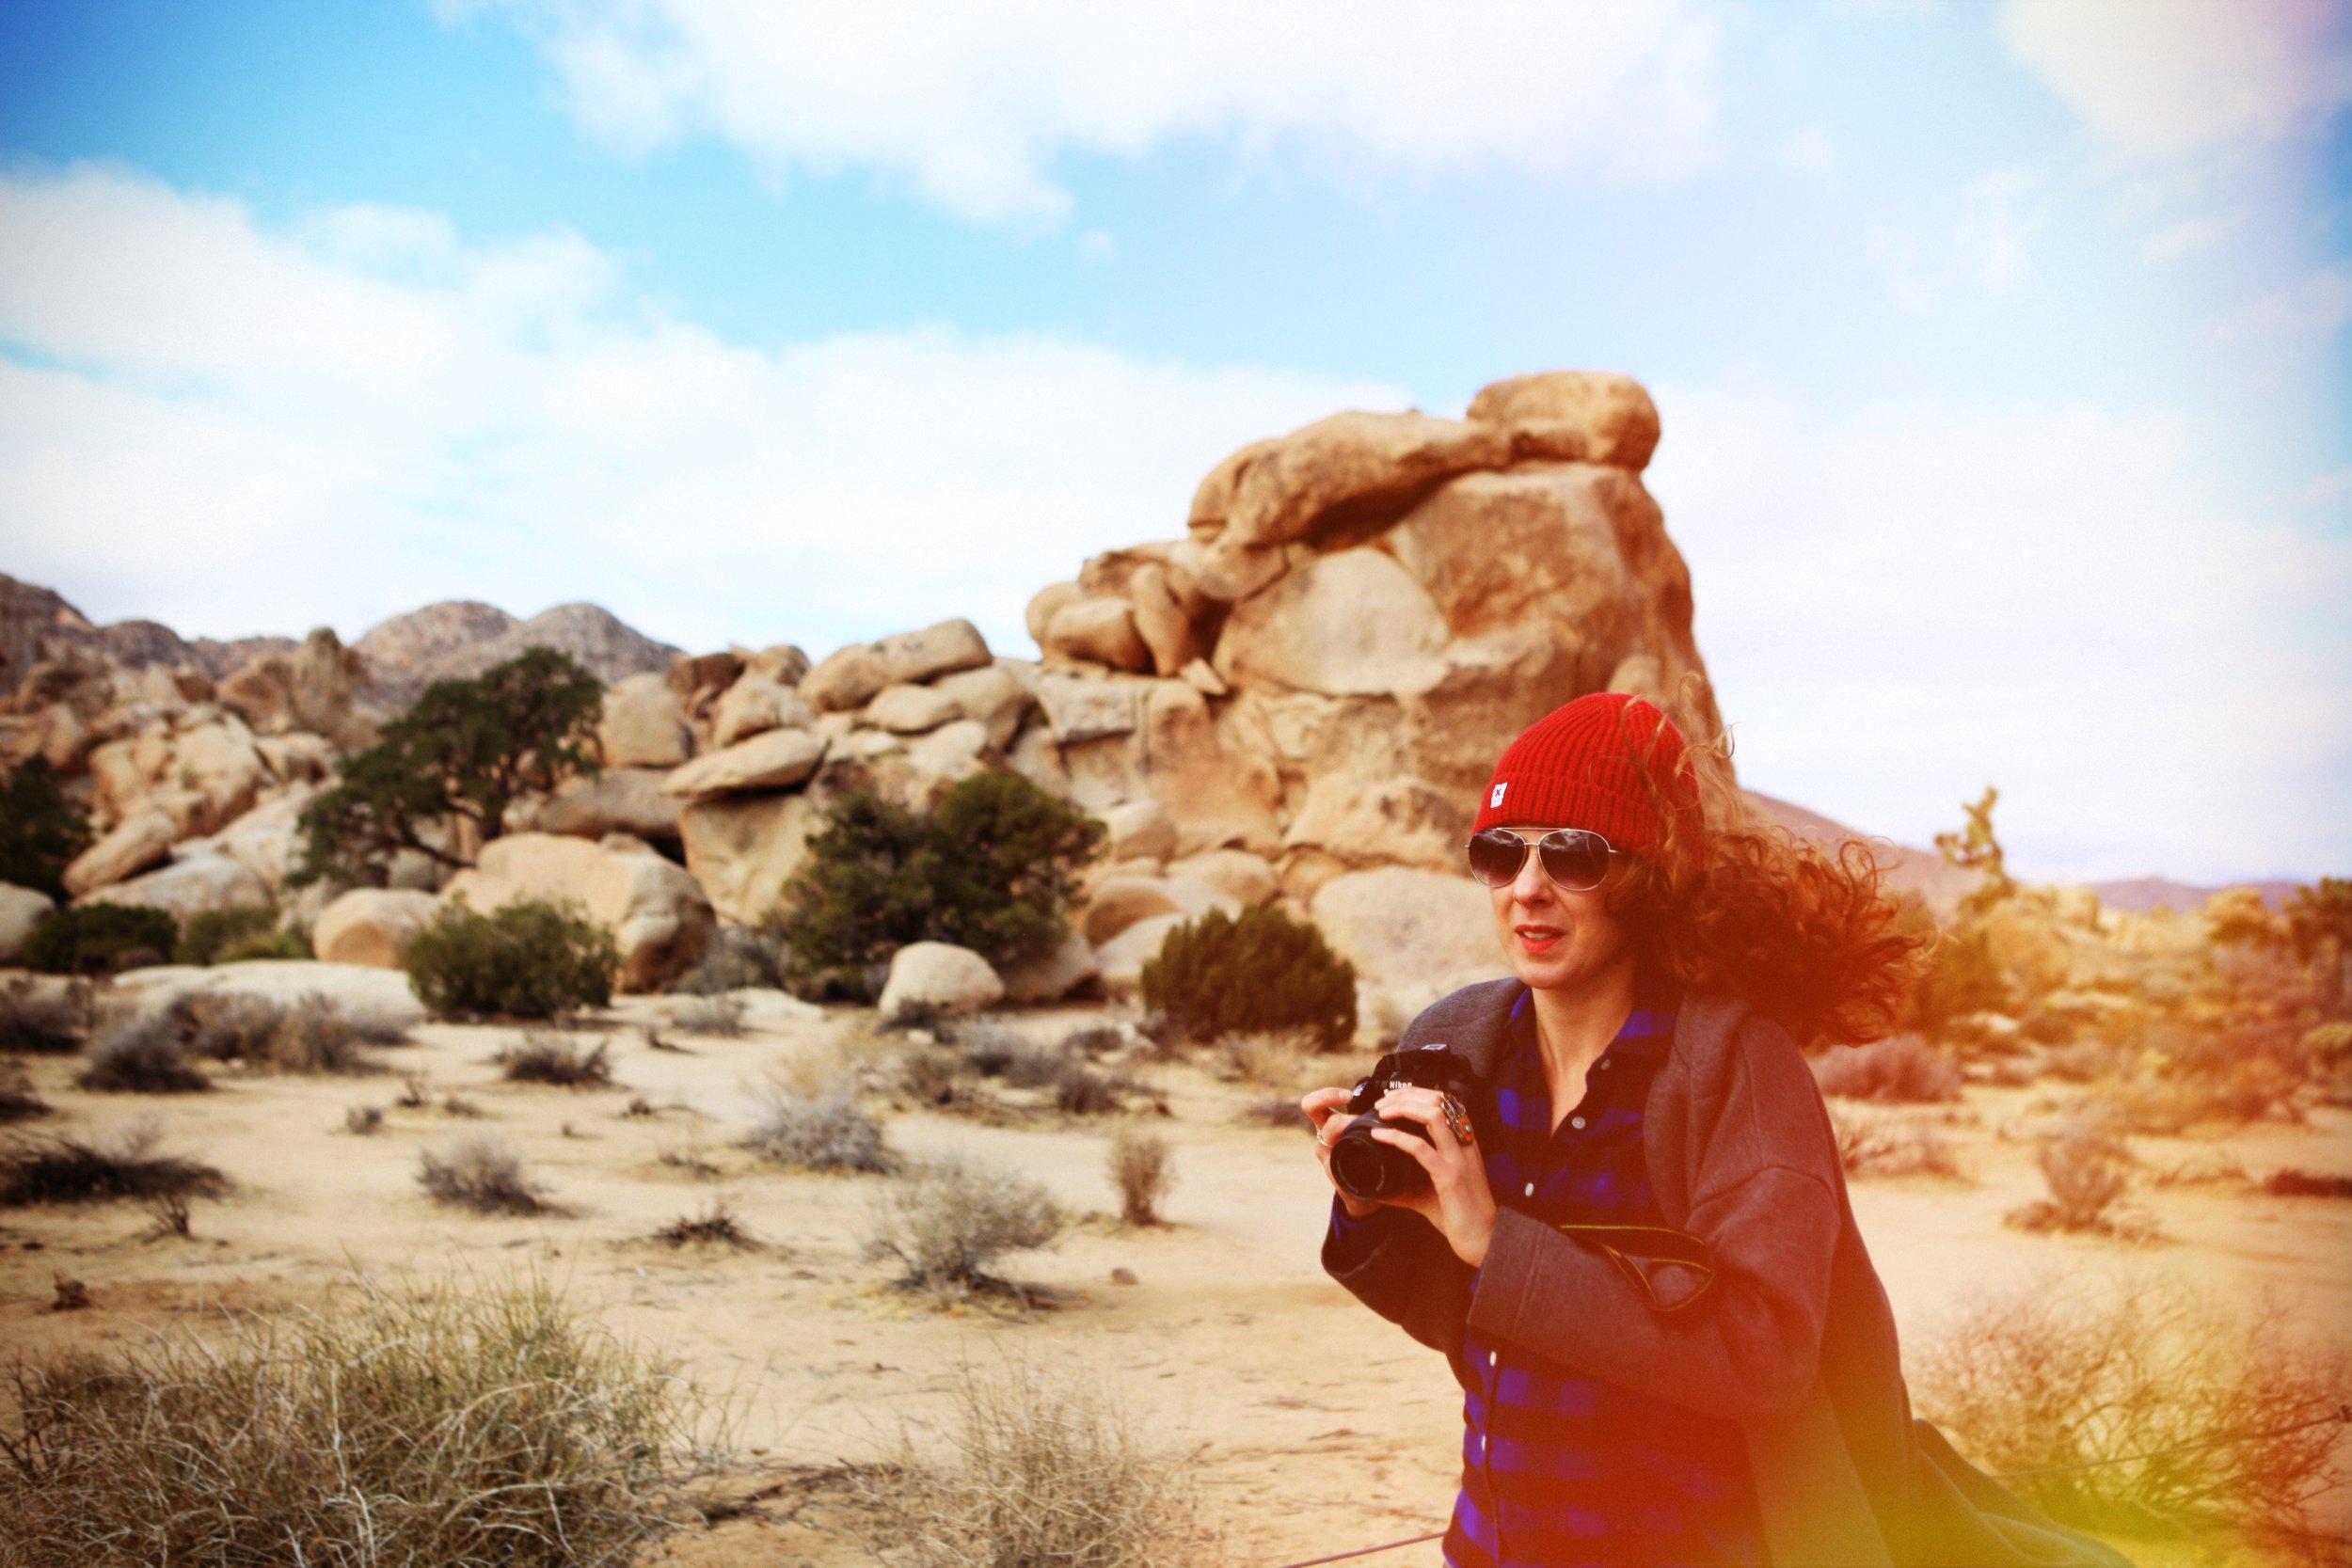 Playing photographer on a windy day in Joshua Tree National Park, California. Photo Cred:  Joni Lahdesmaki